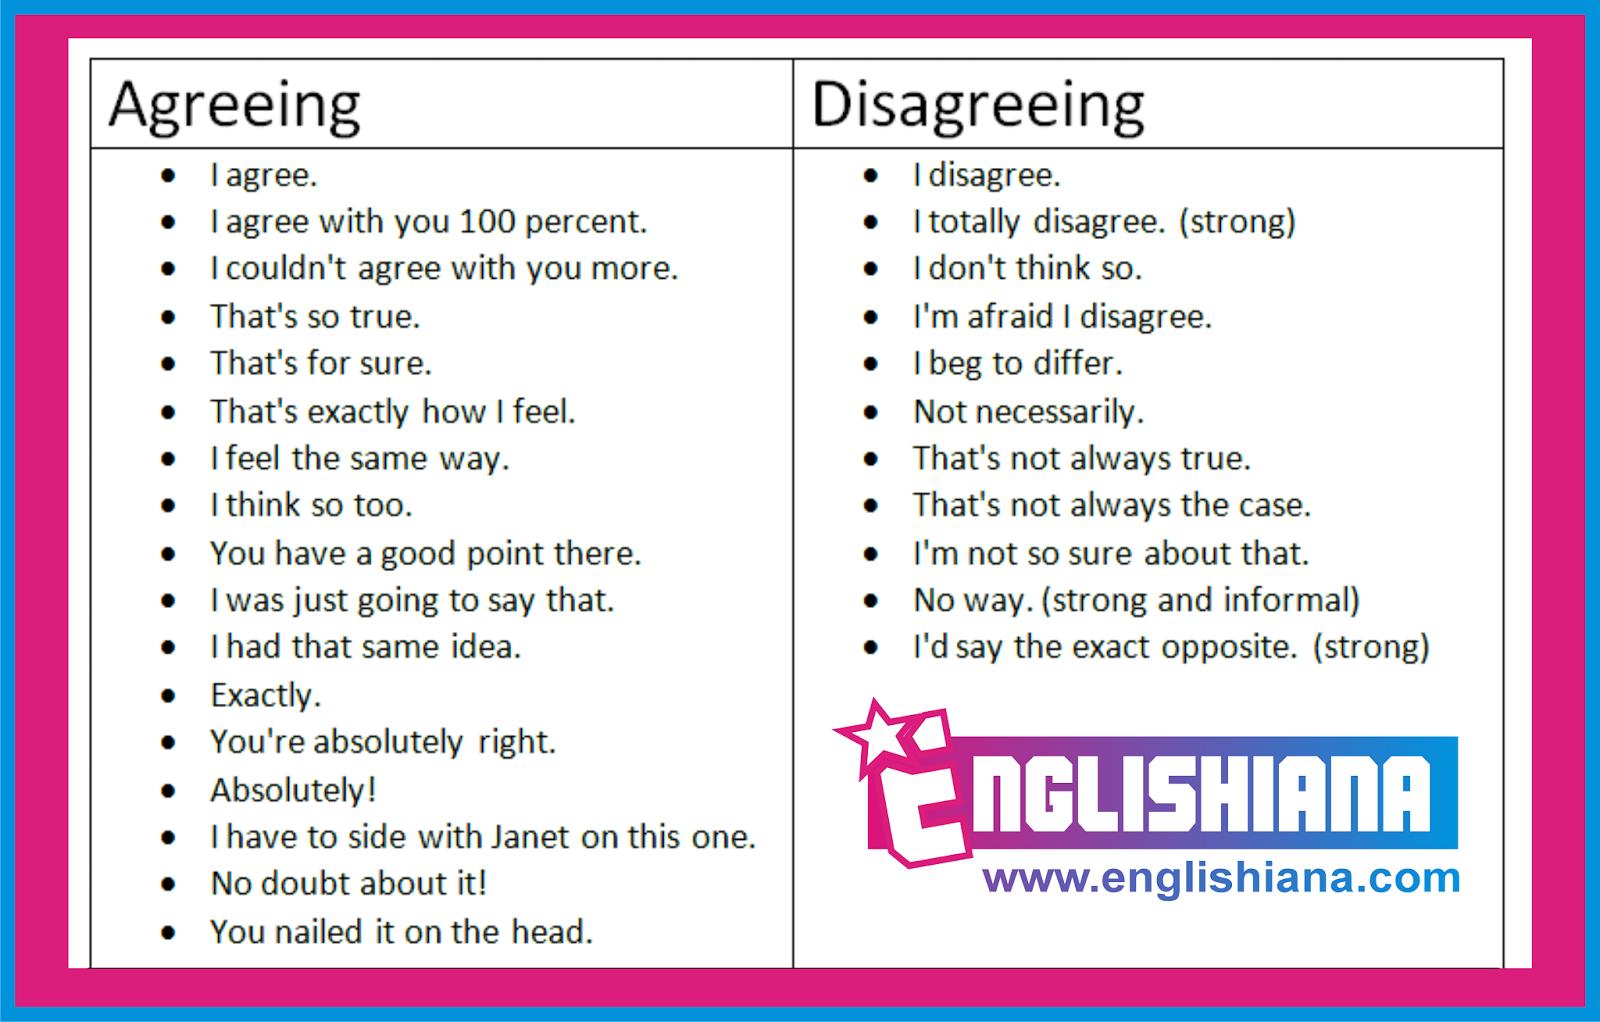 Contoh Dialog Bahasa Inggris 2 Orang Tentang Expressing Agreement